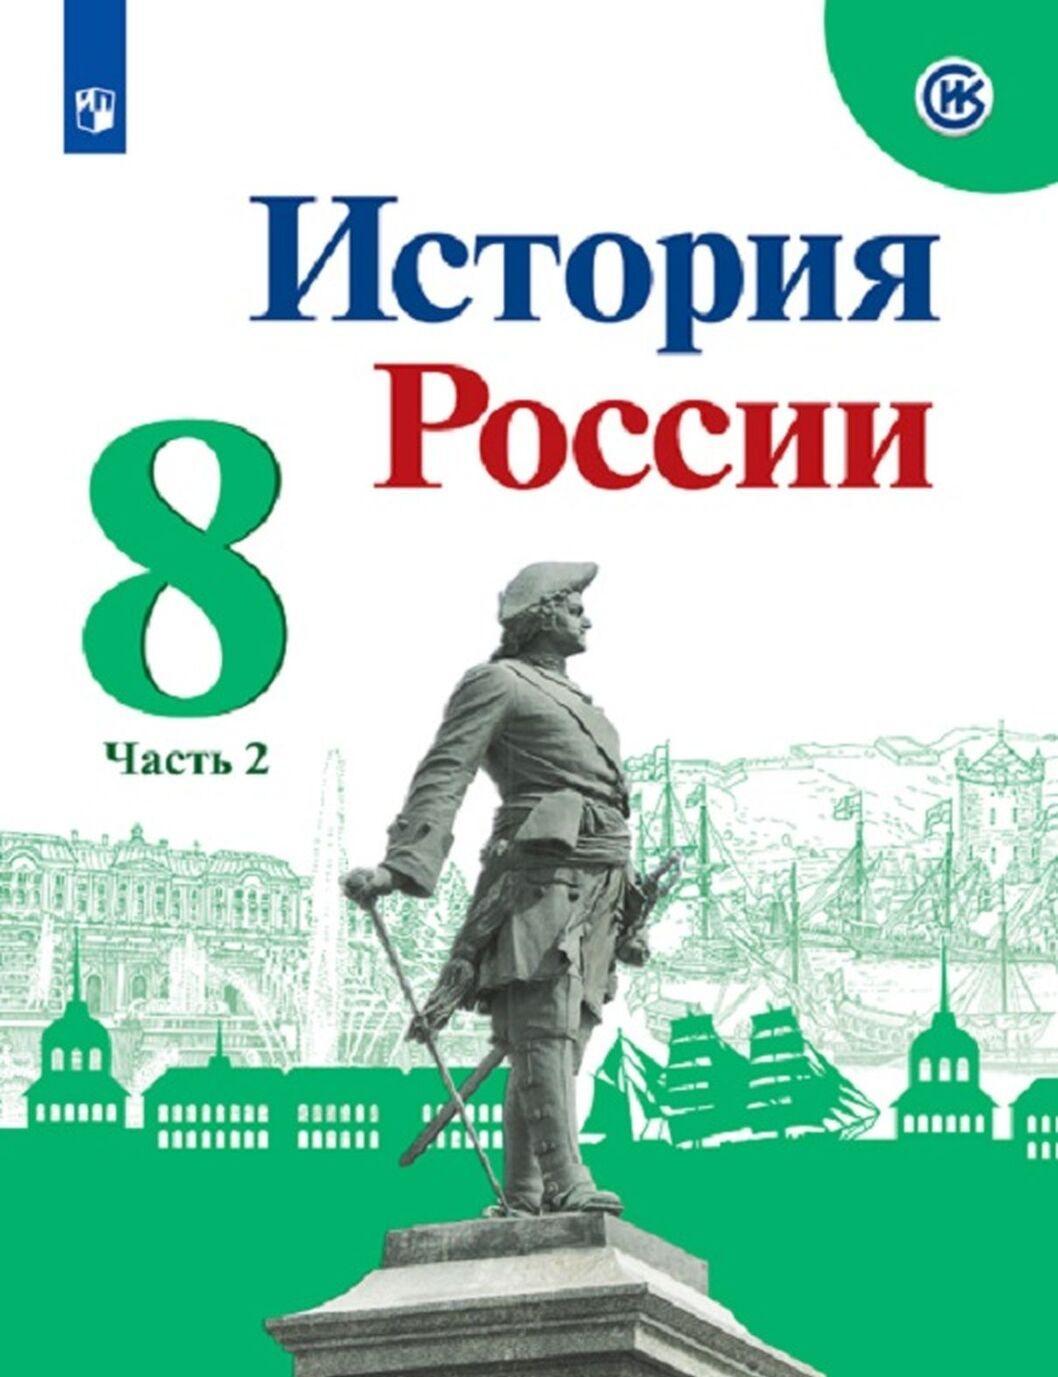 Istorija Rossii. 8 klass. V 2-kh chastjakh. Chast 2